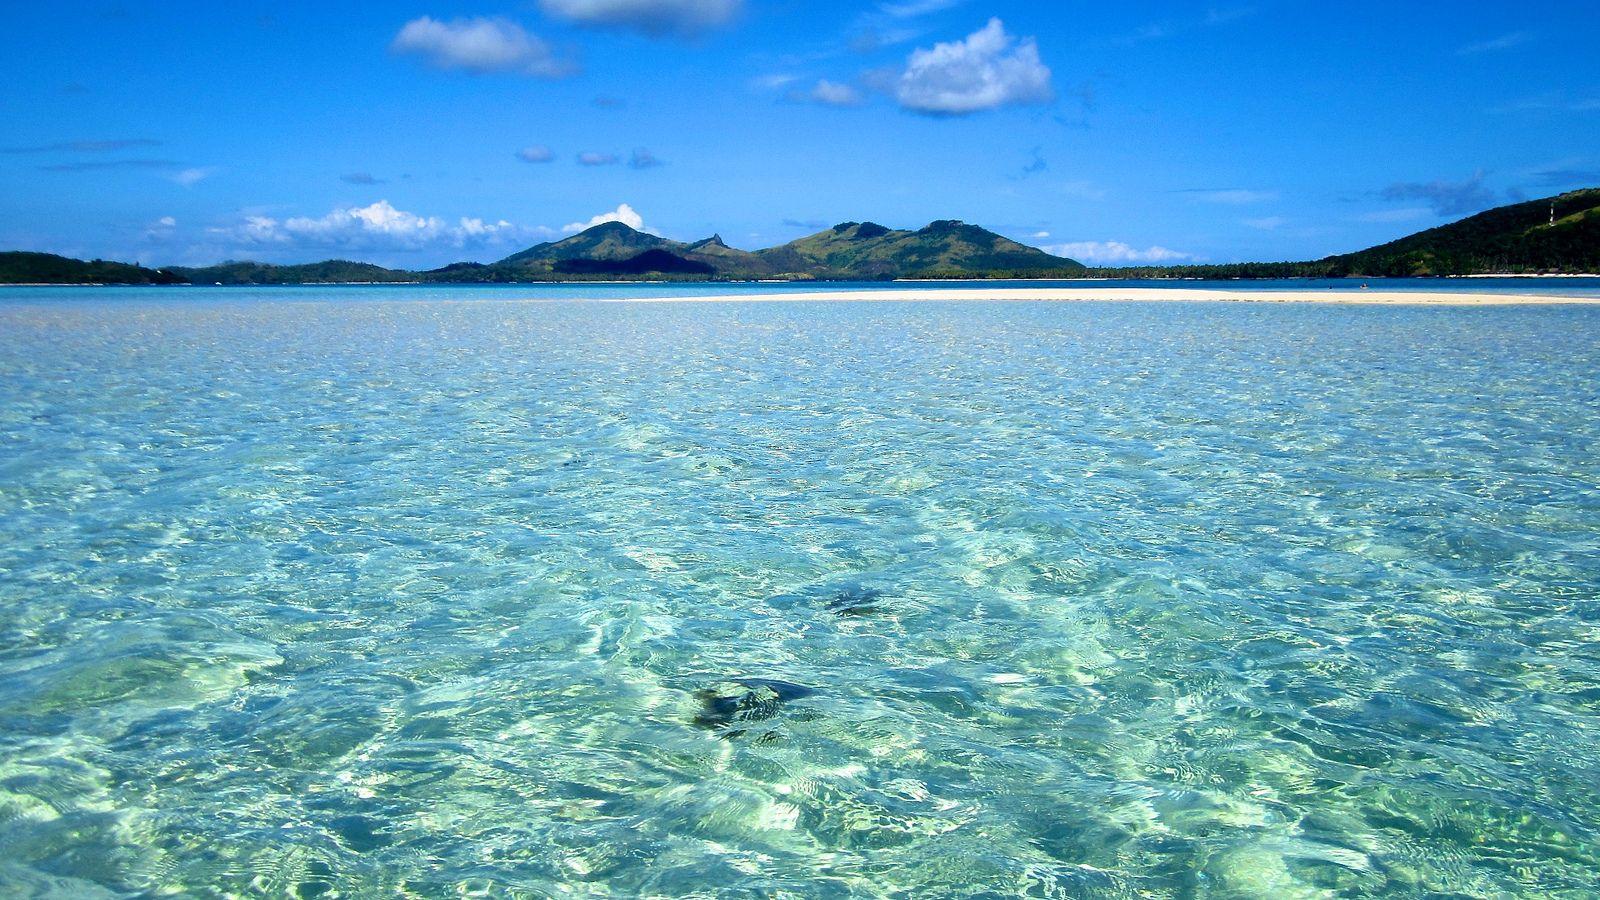 Blue Lagoon | Flickr - Photo Sharing!